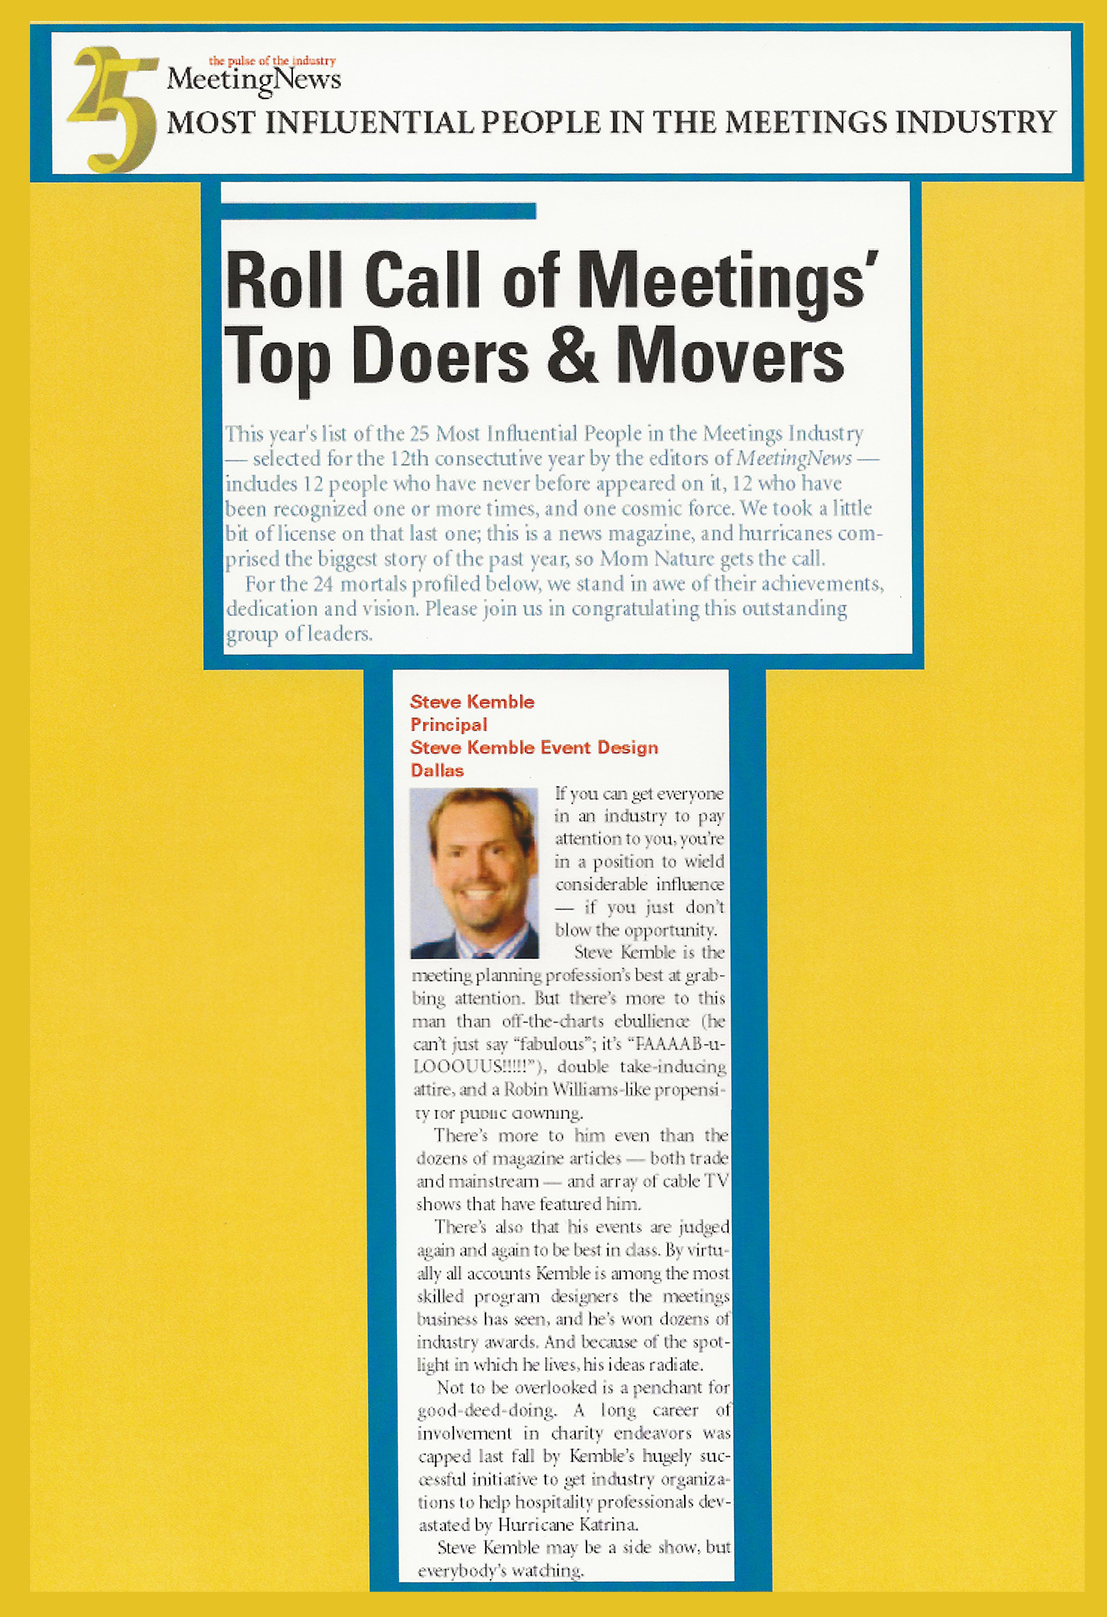 Steve Kemble Press, Meeting News